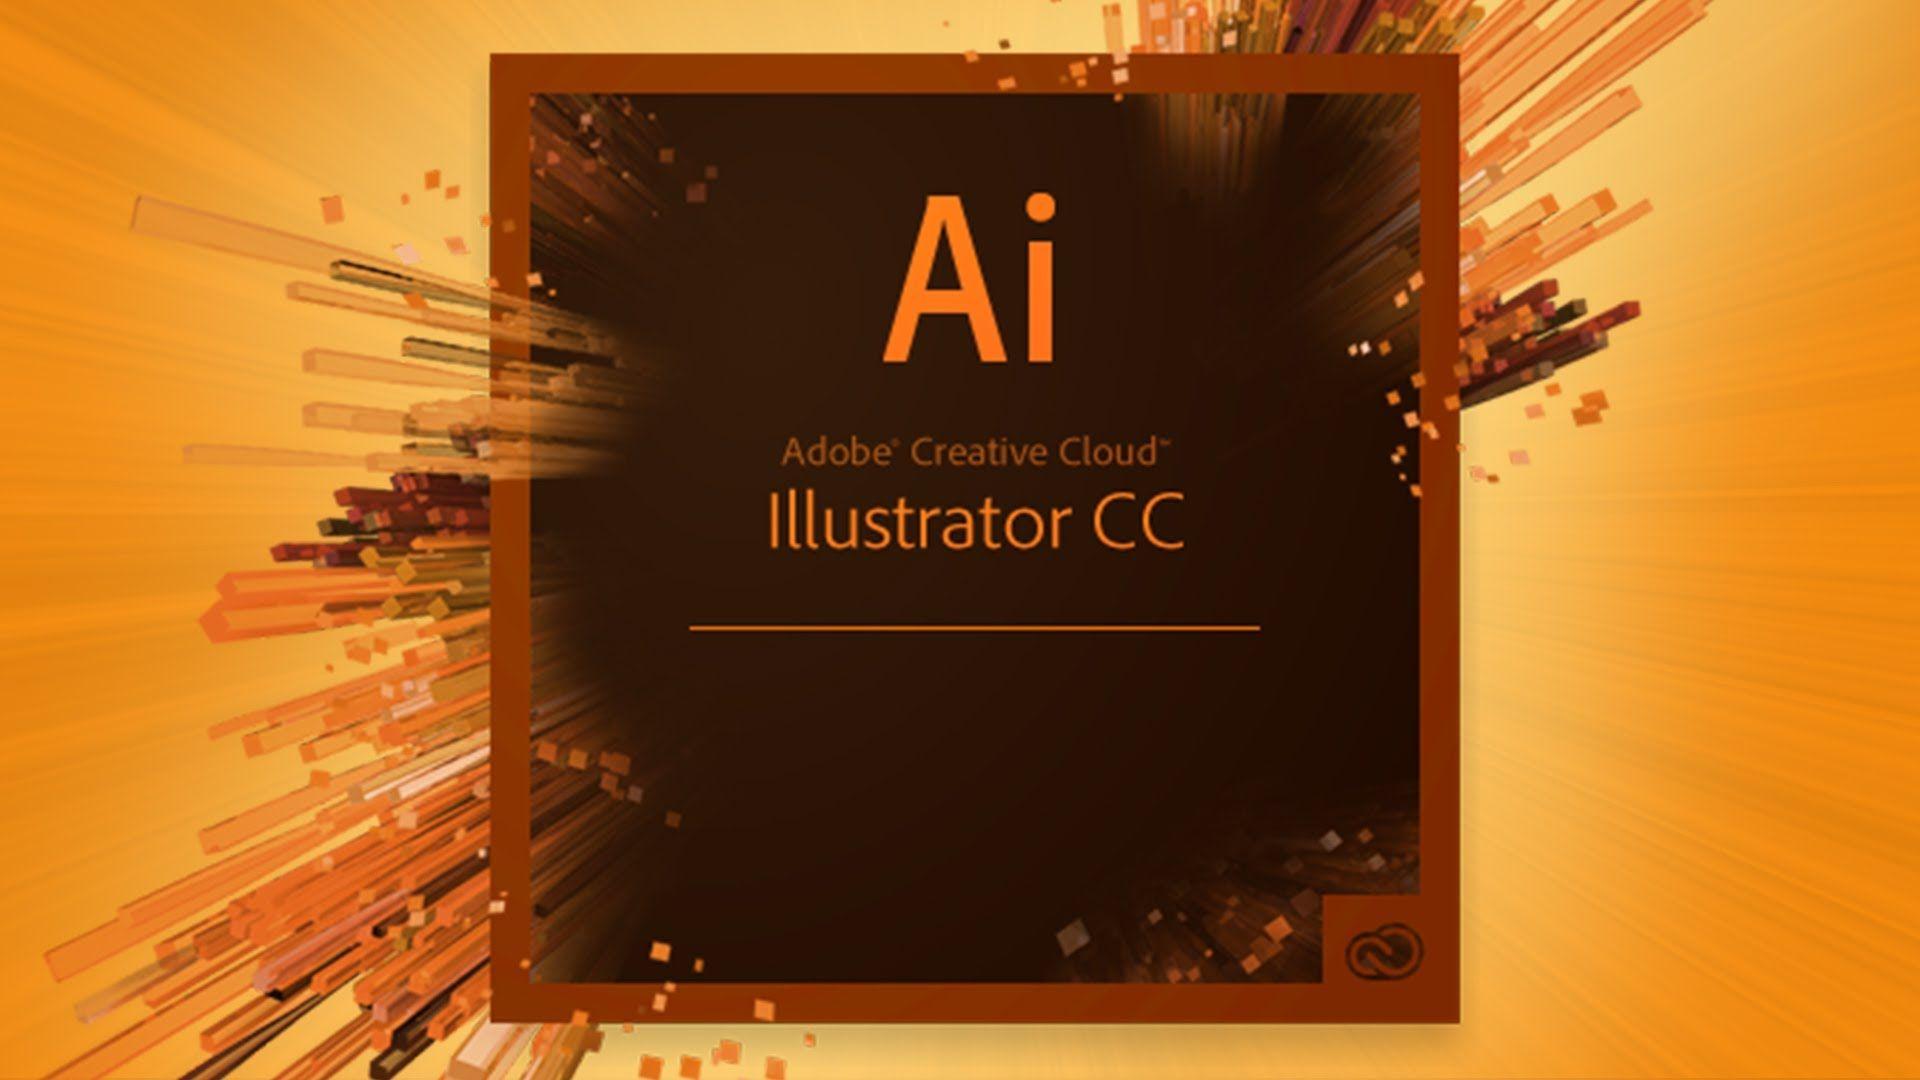 Ai Adobe Illustrator Cc